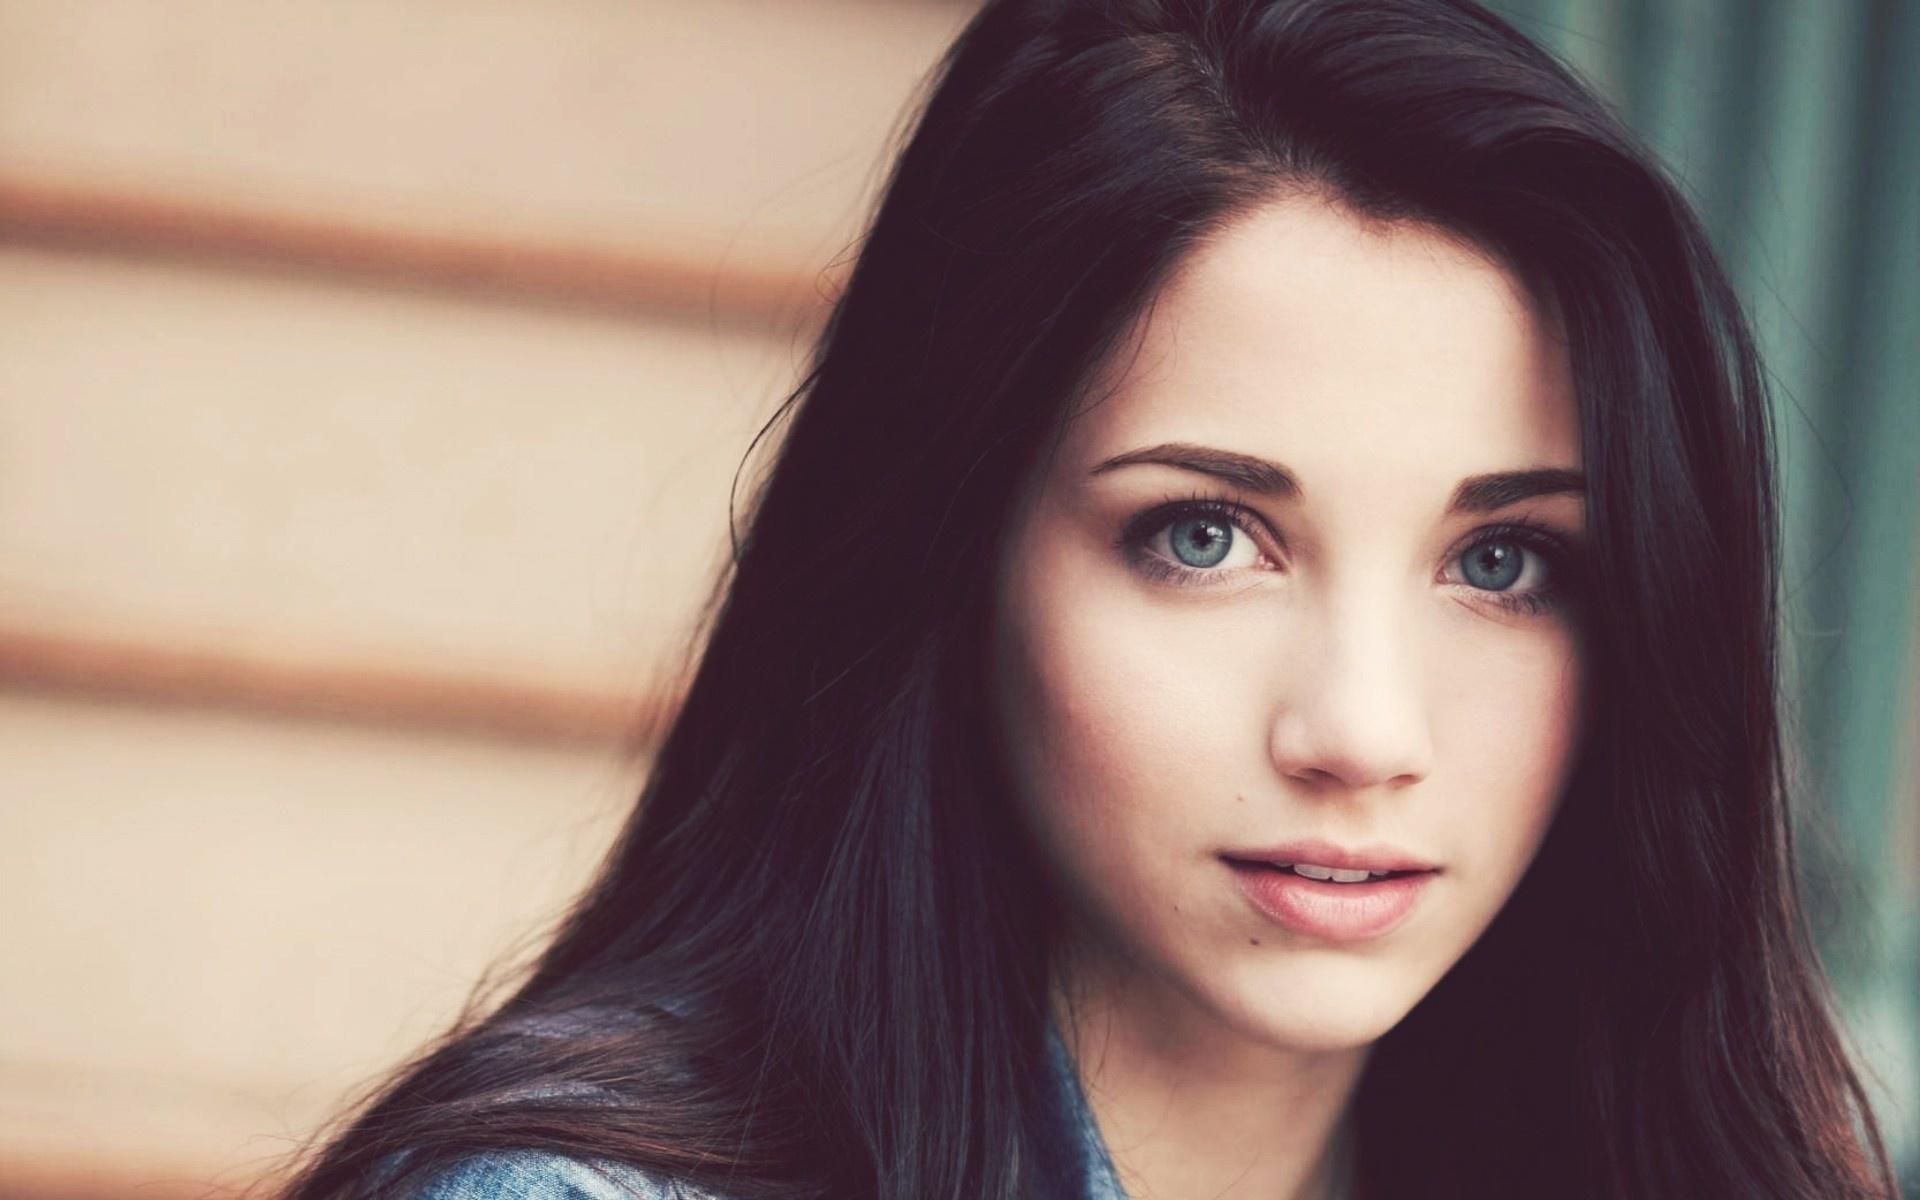 Красивую девушку вот так